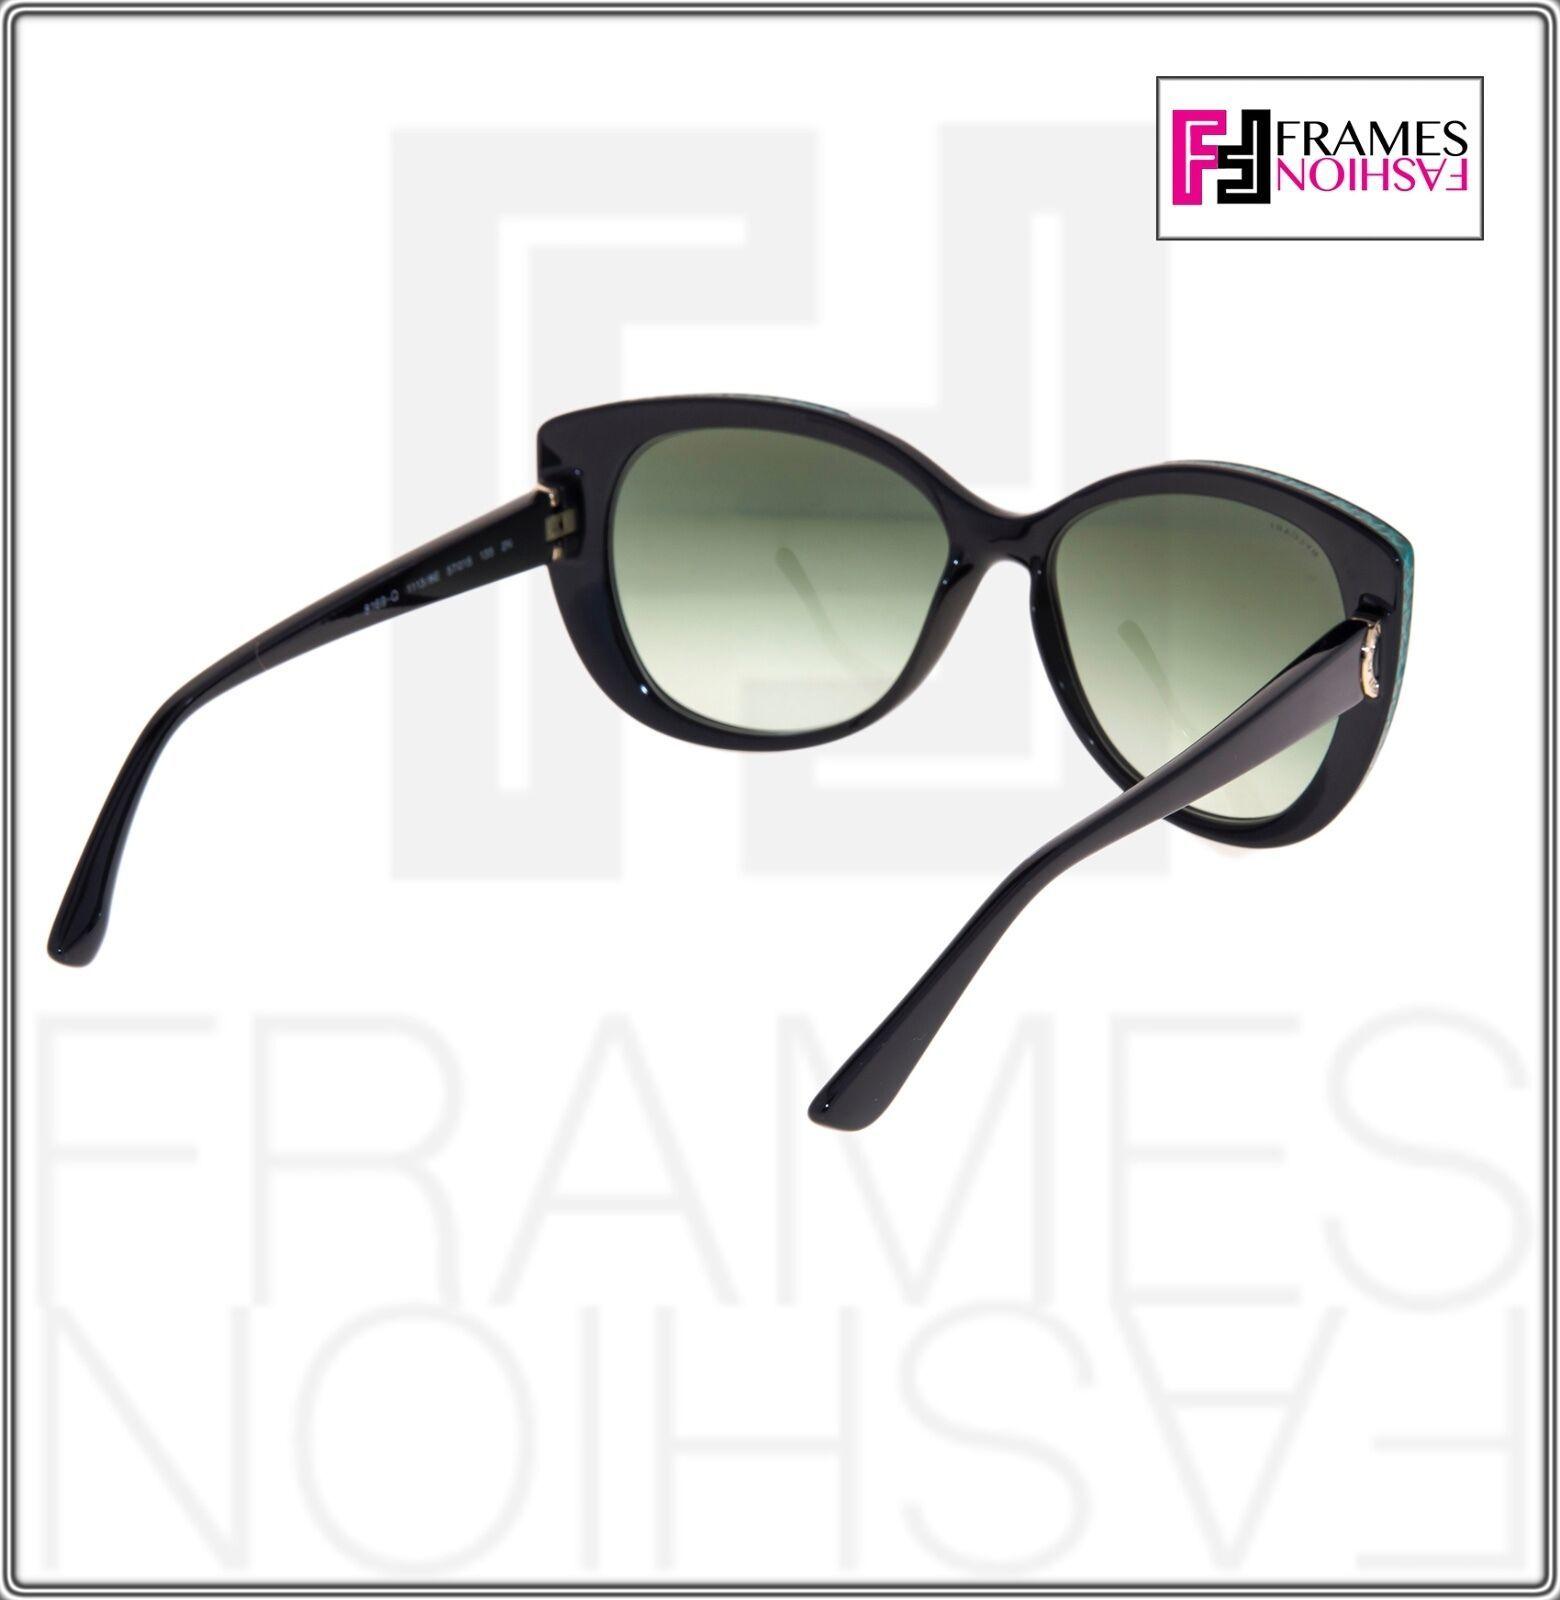 BVLGARI LOGO BV8169Q Black Green Leather Gradient Cat Eye Sunglasses Gold 8169 image 4